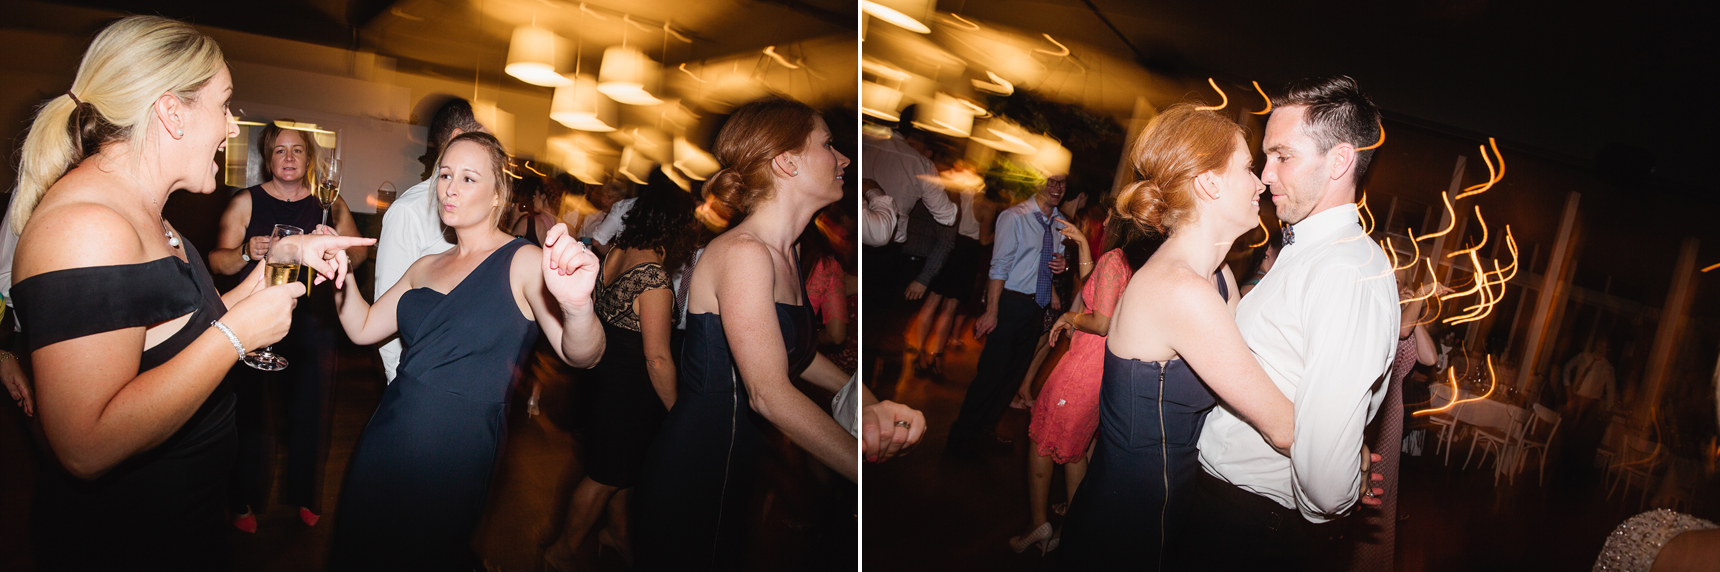 AngeRuss_MobyDicks_WhaleBeach_Wedding_Photography051.jpg